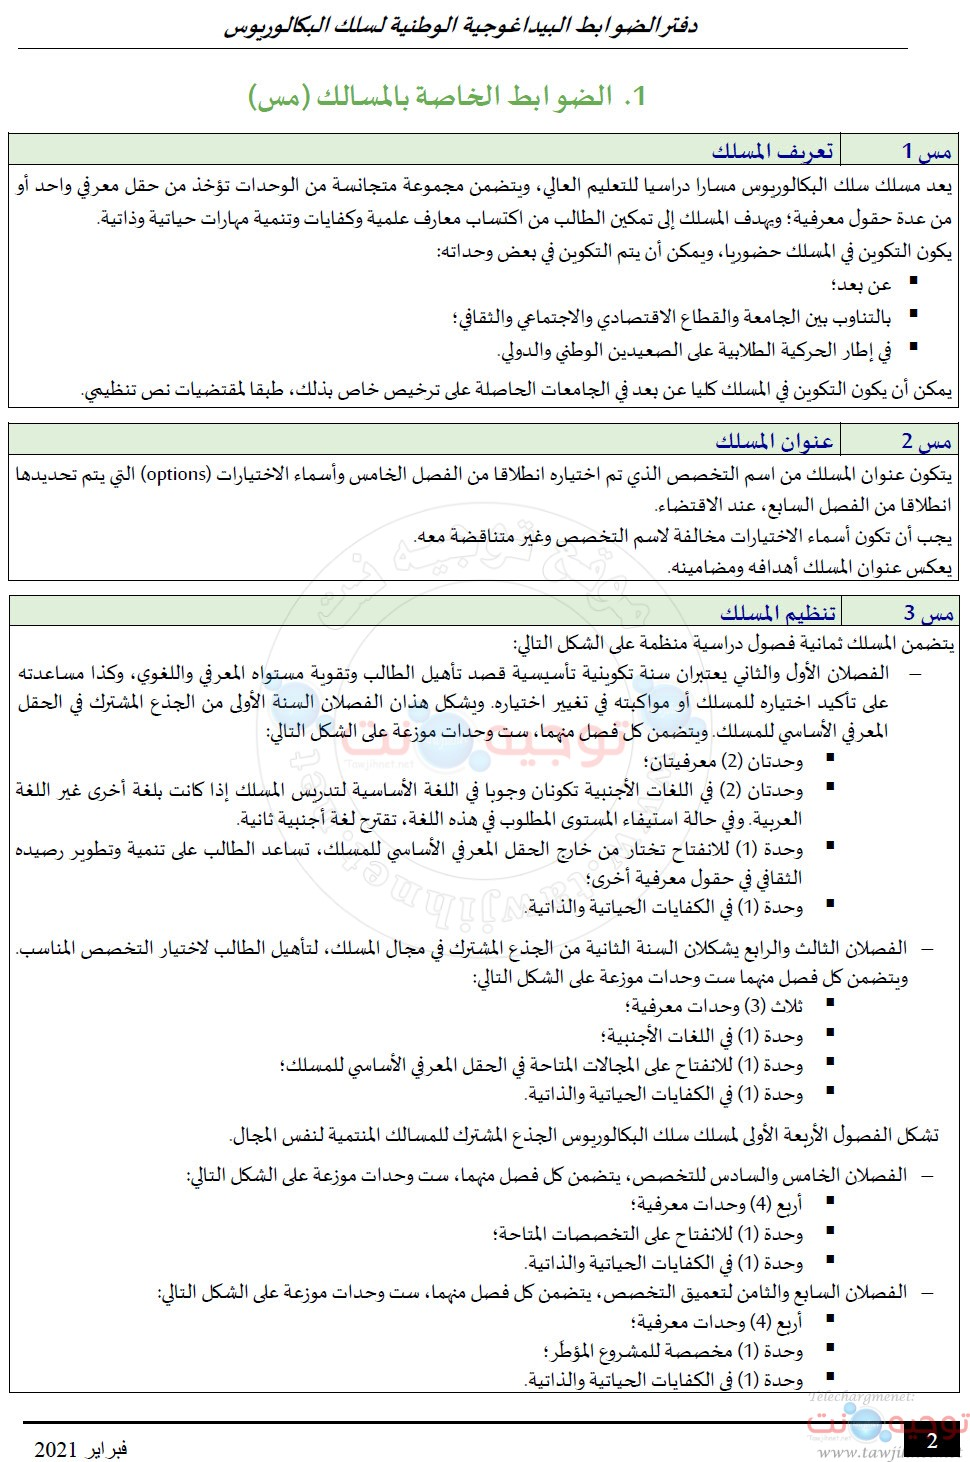 Bachelor-CNPN-normes-pedagoqiques-2021_Page_02.jpg